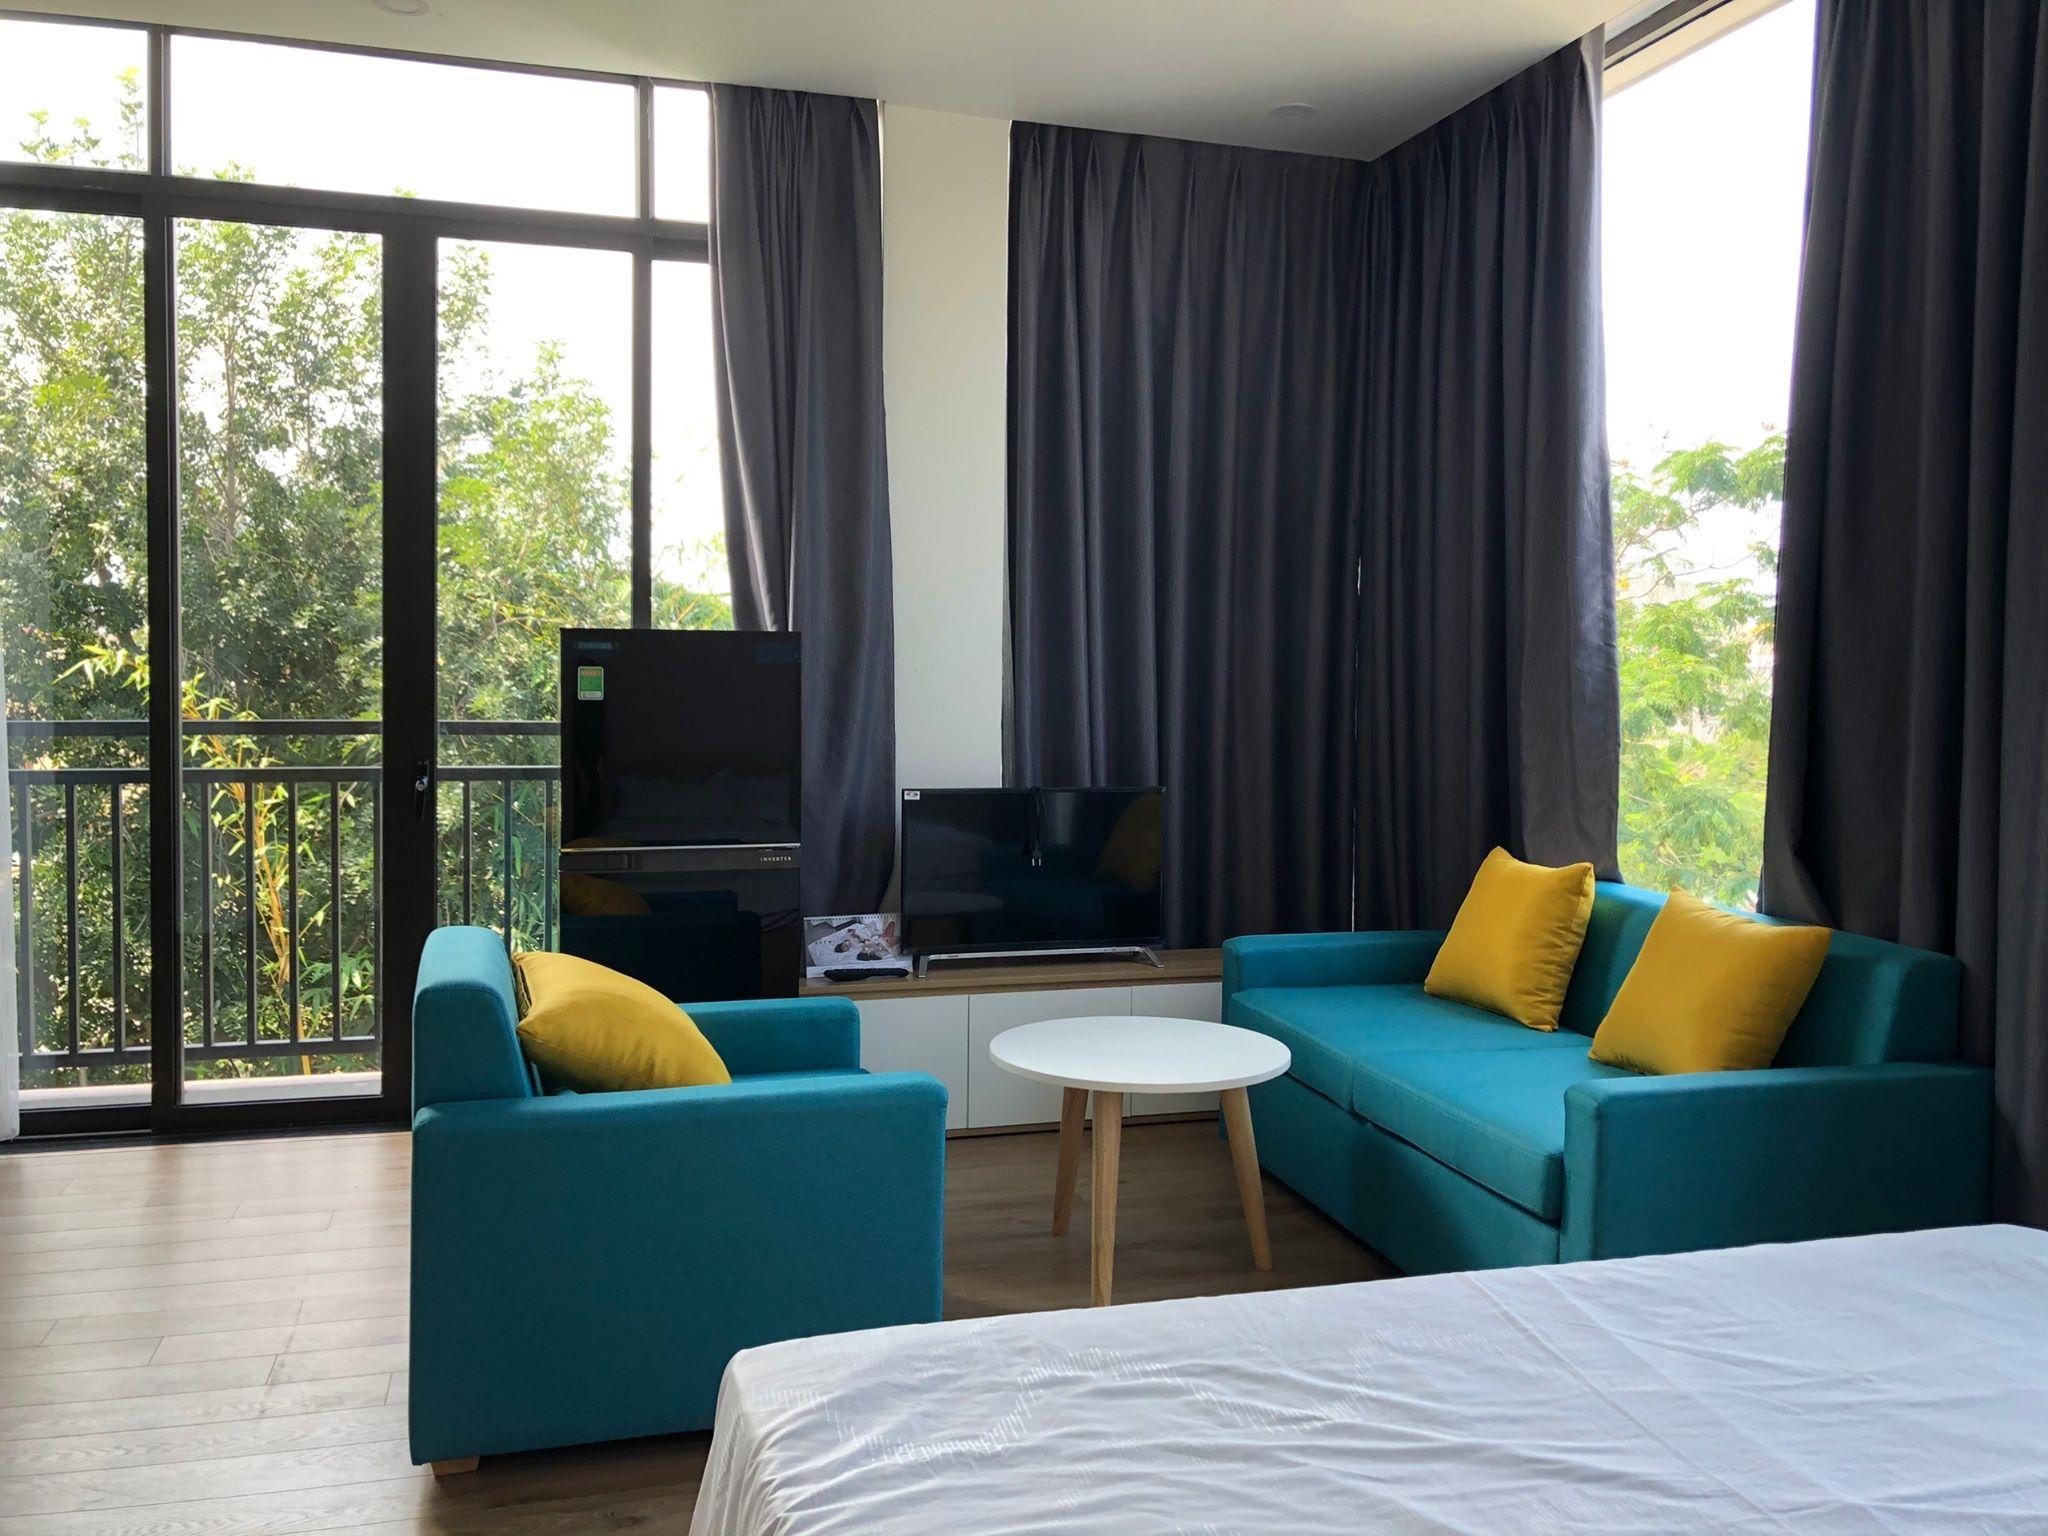 Bright Studio For Rent close to Han river Da Nang